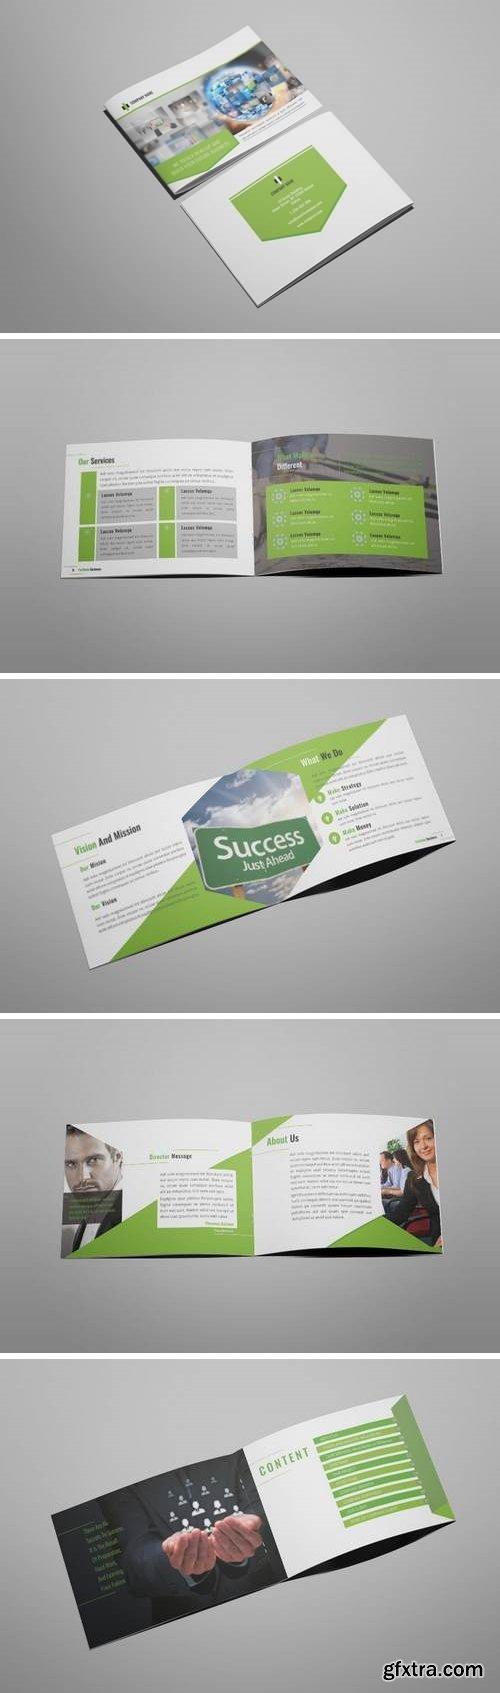 CM - Wonderpro - A5 Business Brochure 3275787